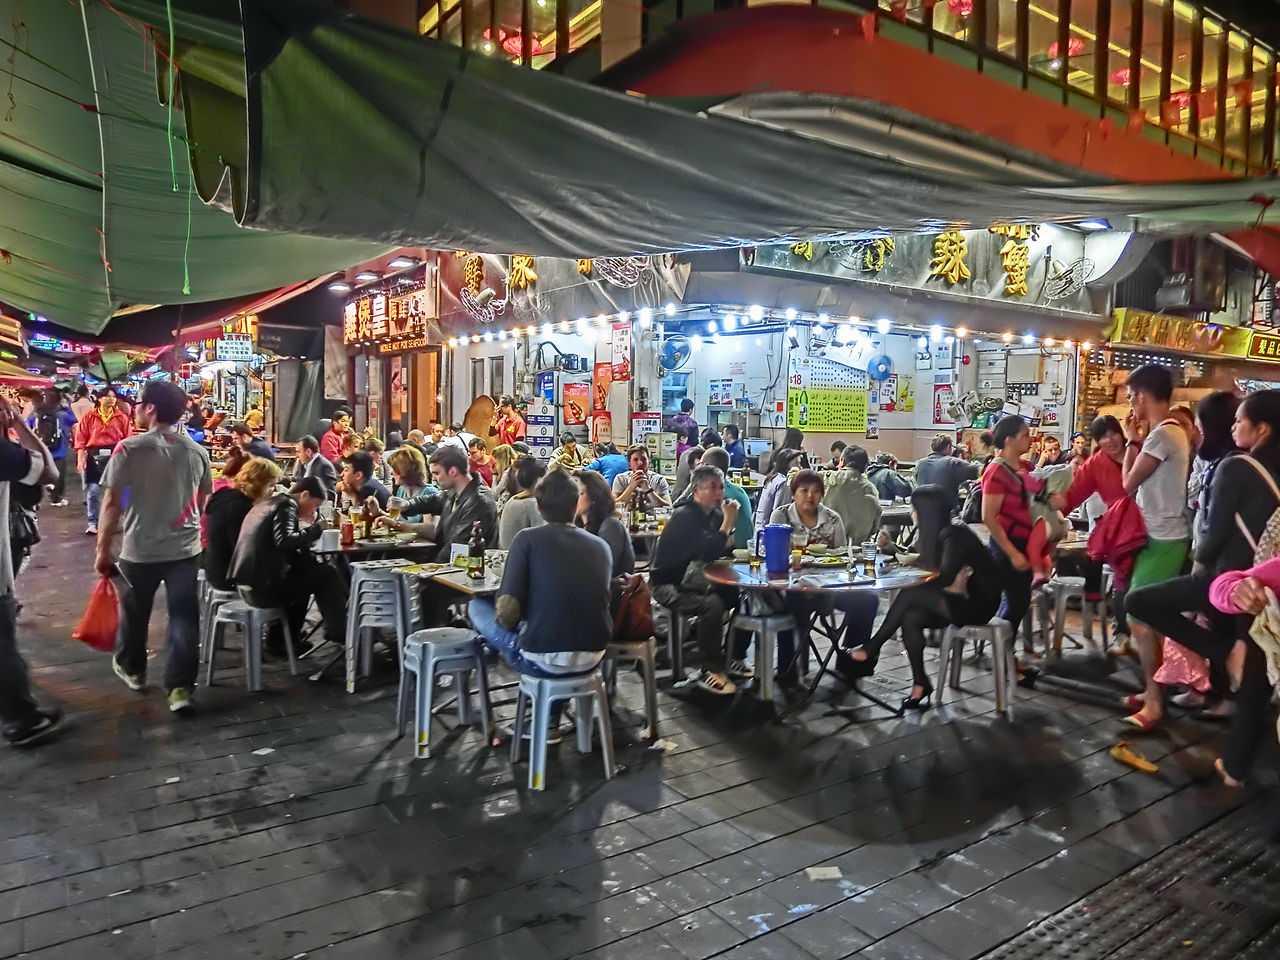 Night restaurants & stalls in Temple Street, Jordan Road, Hong Kong